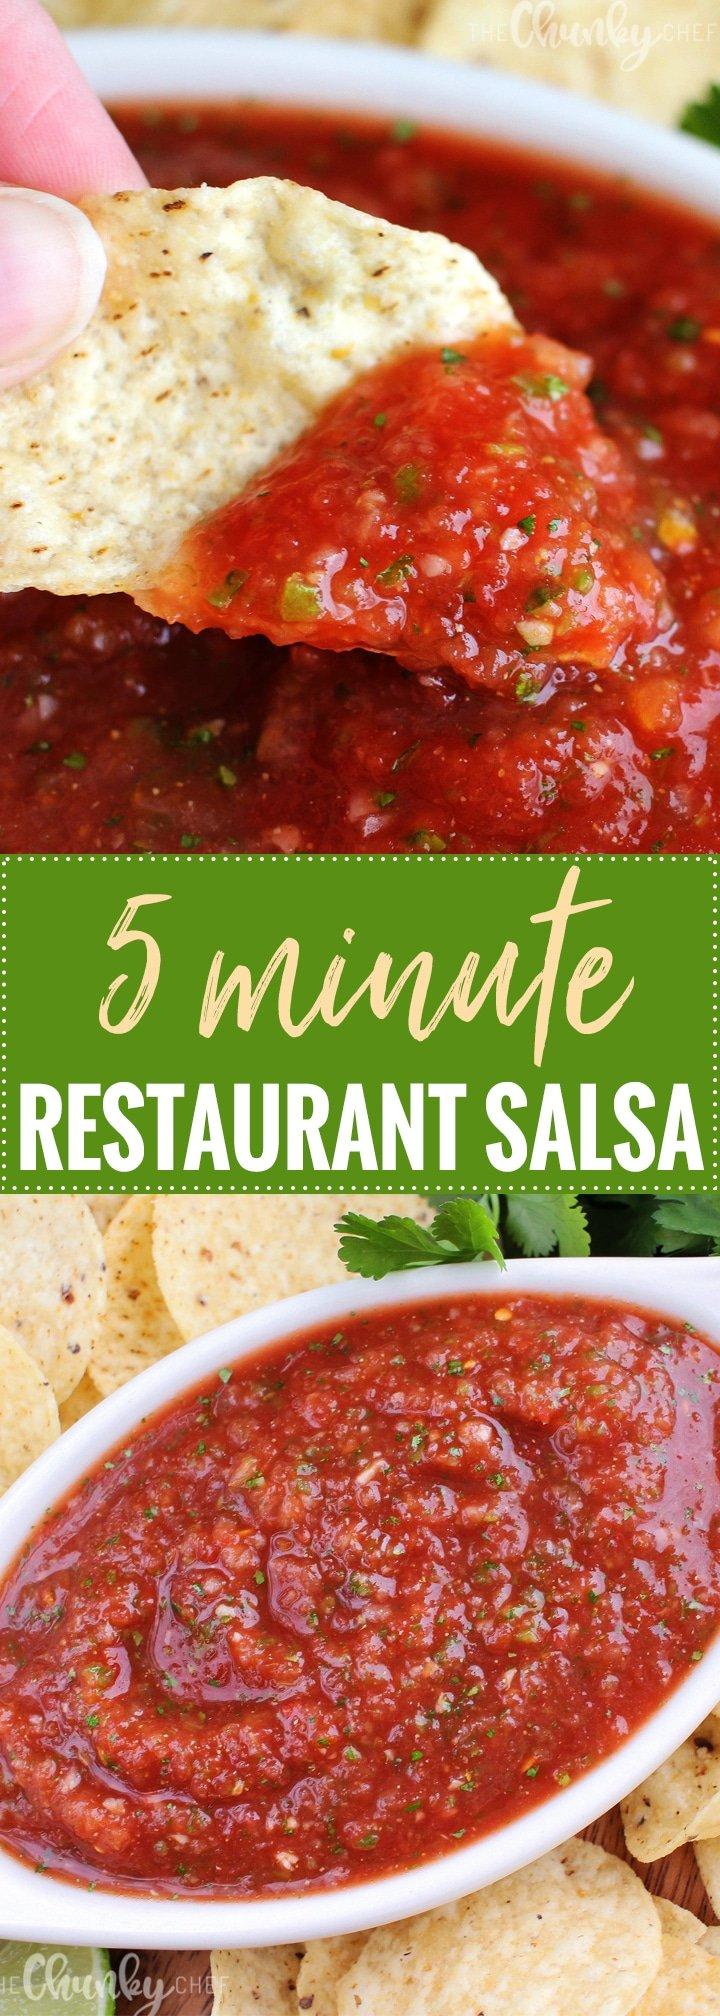 5 minute restaurant salsa the chunky chef